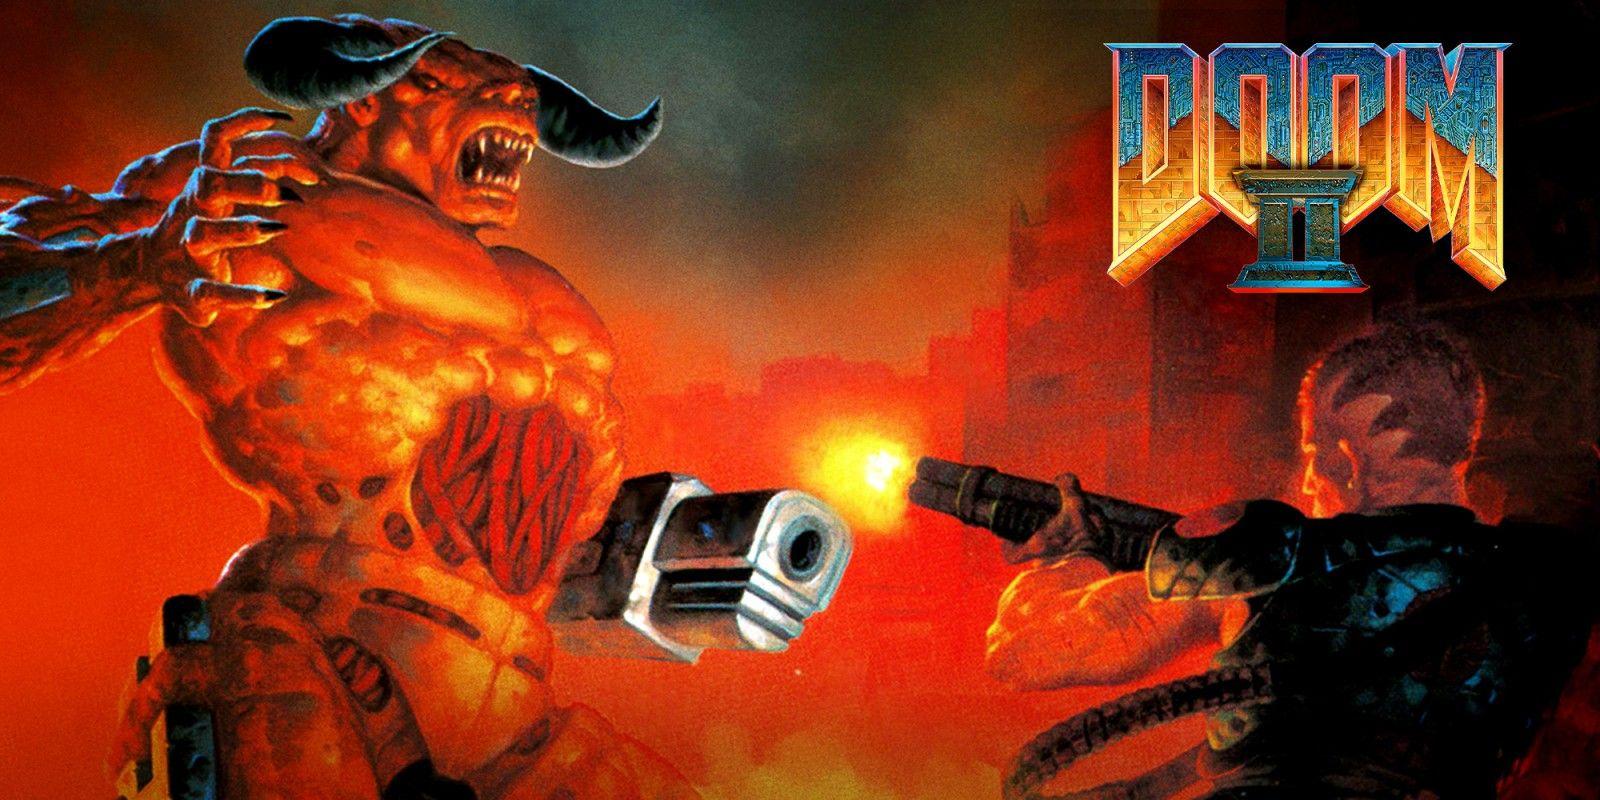 Bethesda Softworks released the original DOOM trilogy today